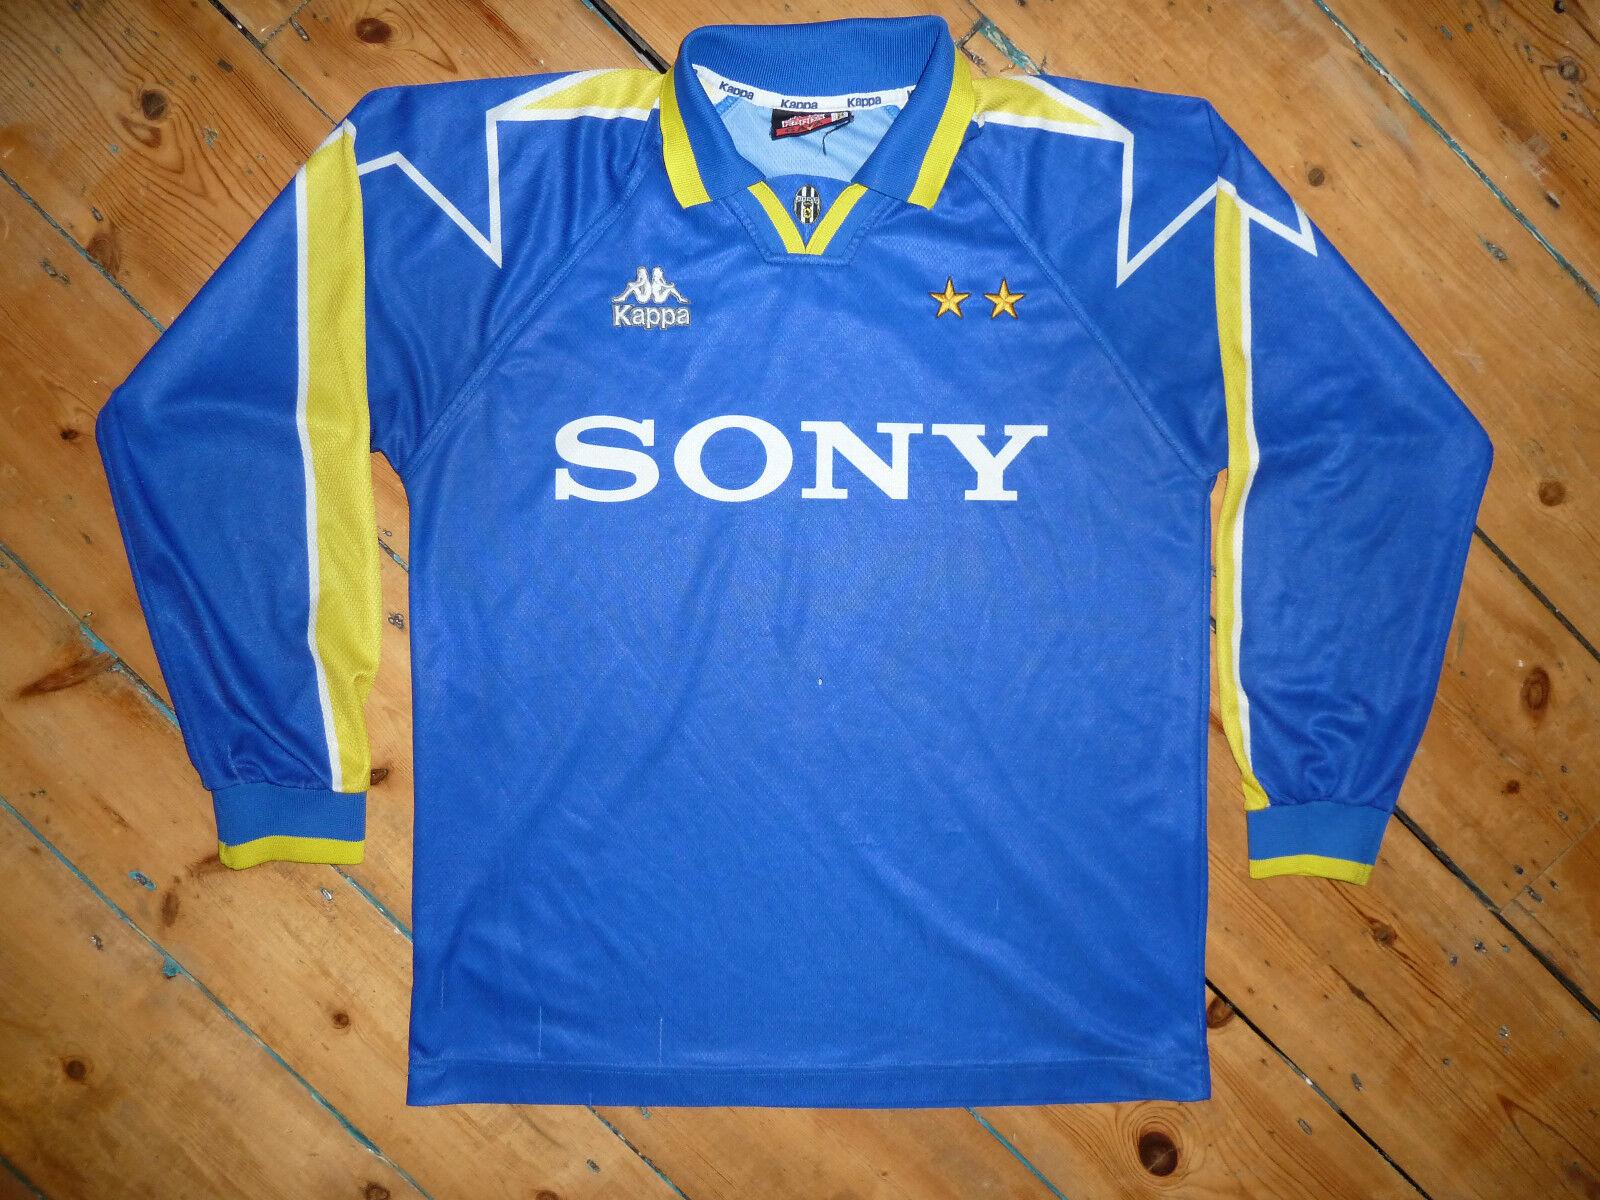 Gree Juventus Italia 199596 Trasferta Calcio Maglia Kappa uomoica Lunga